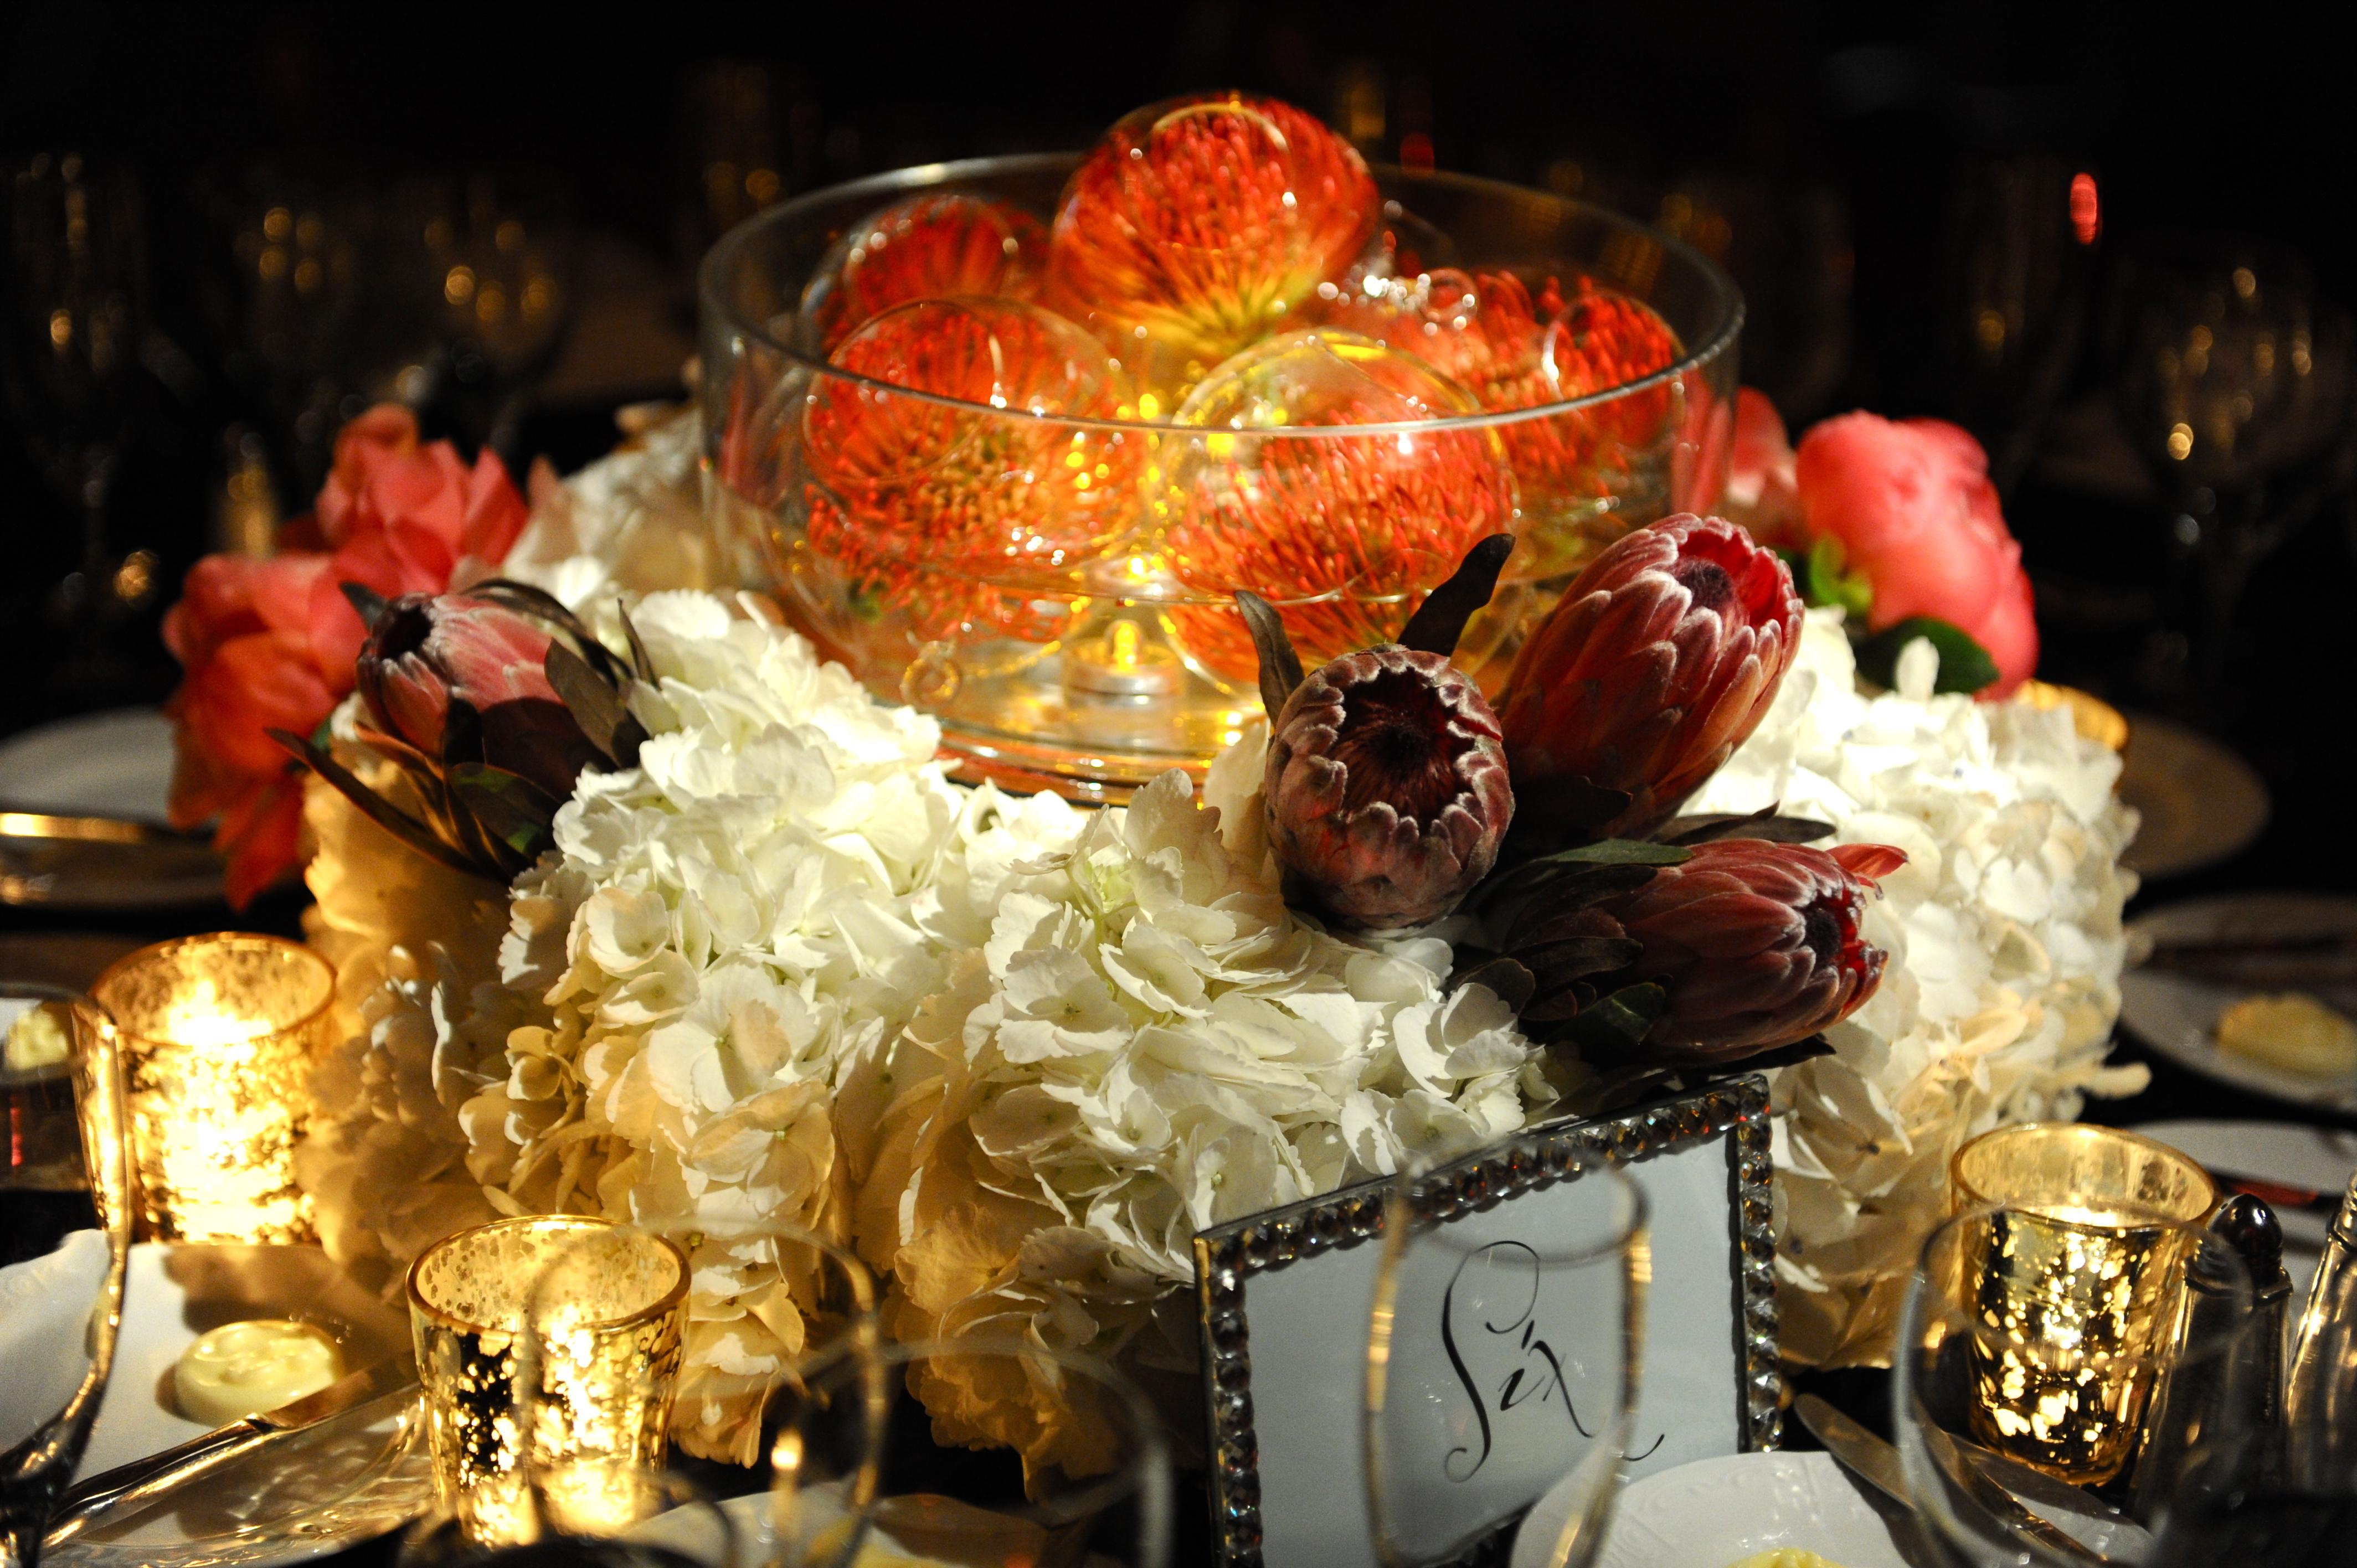 orange, Centerpiece, Wedding, Coral, Formal, Tablescape, Dramatic, Persephone eddie